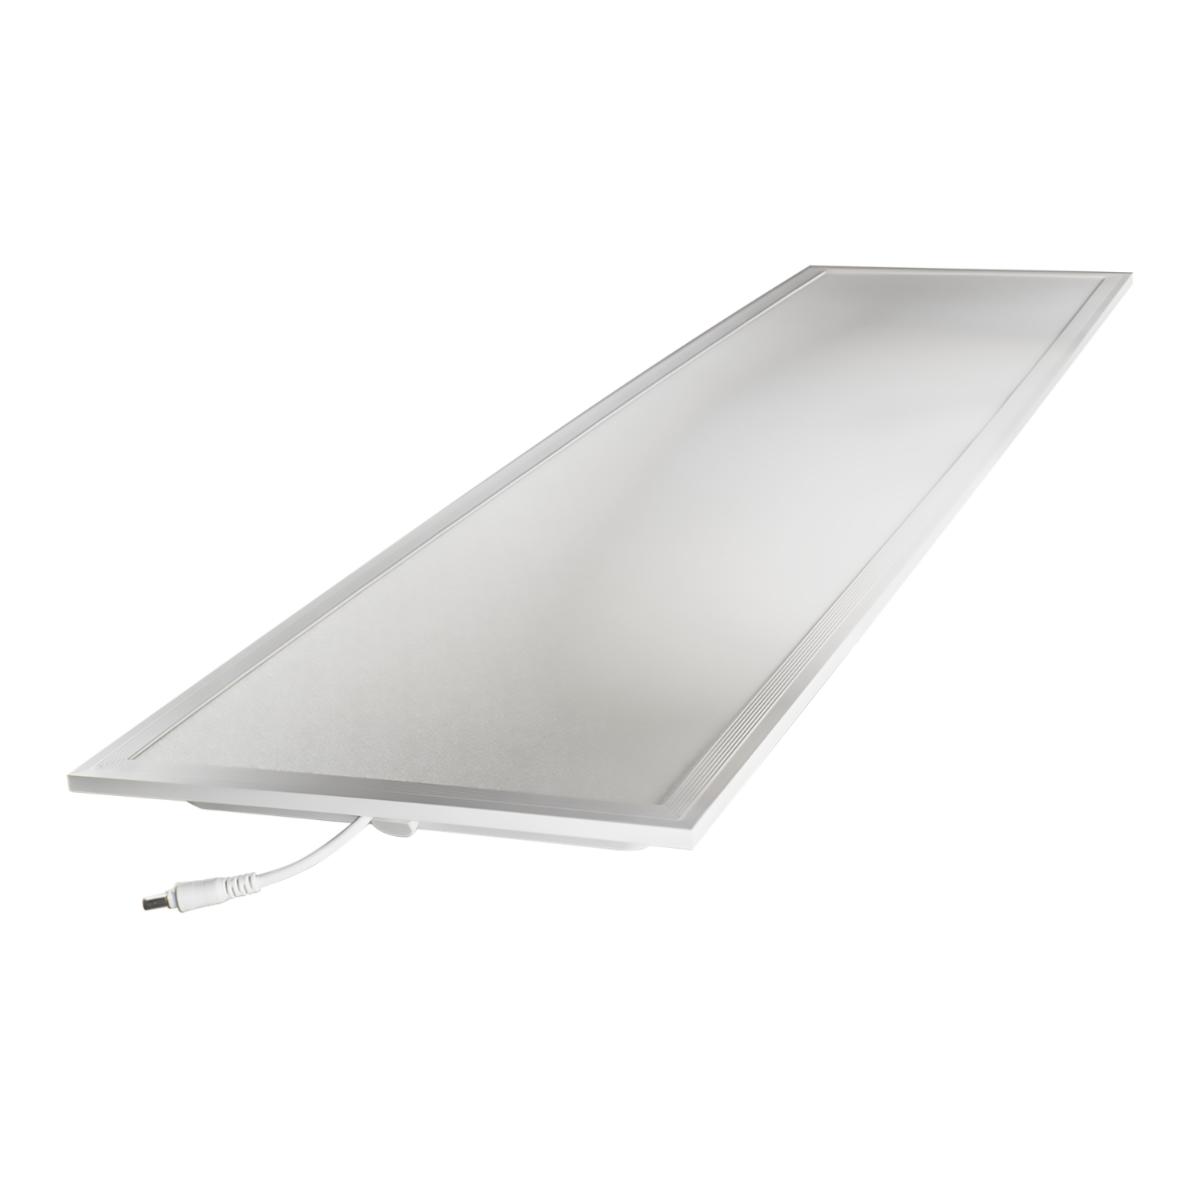 Noxion LED Panel Delta Pro Highlum V2.0 Xitanium DALI 40W 30x120cm 3000K 5280lm UGR <19 | Dali Dimmbar - Warmweiß - Ersatz für 2x36W